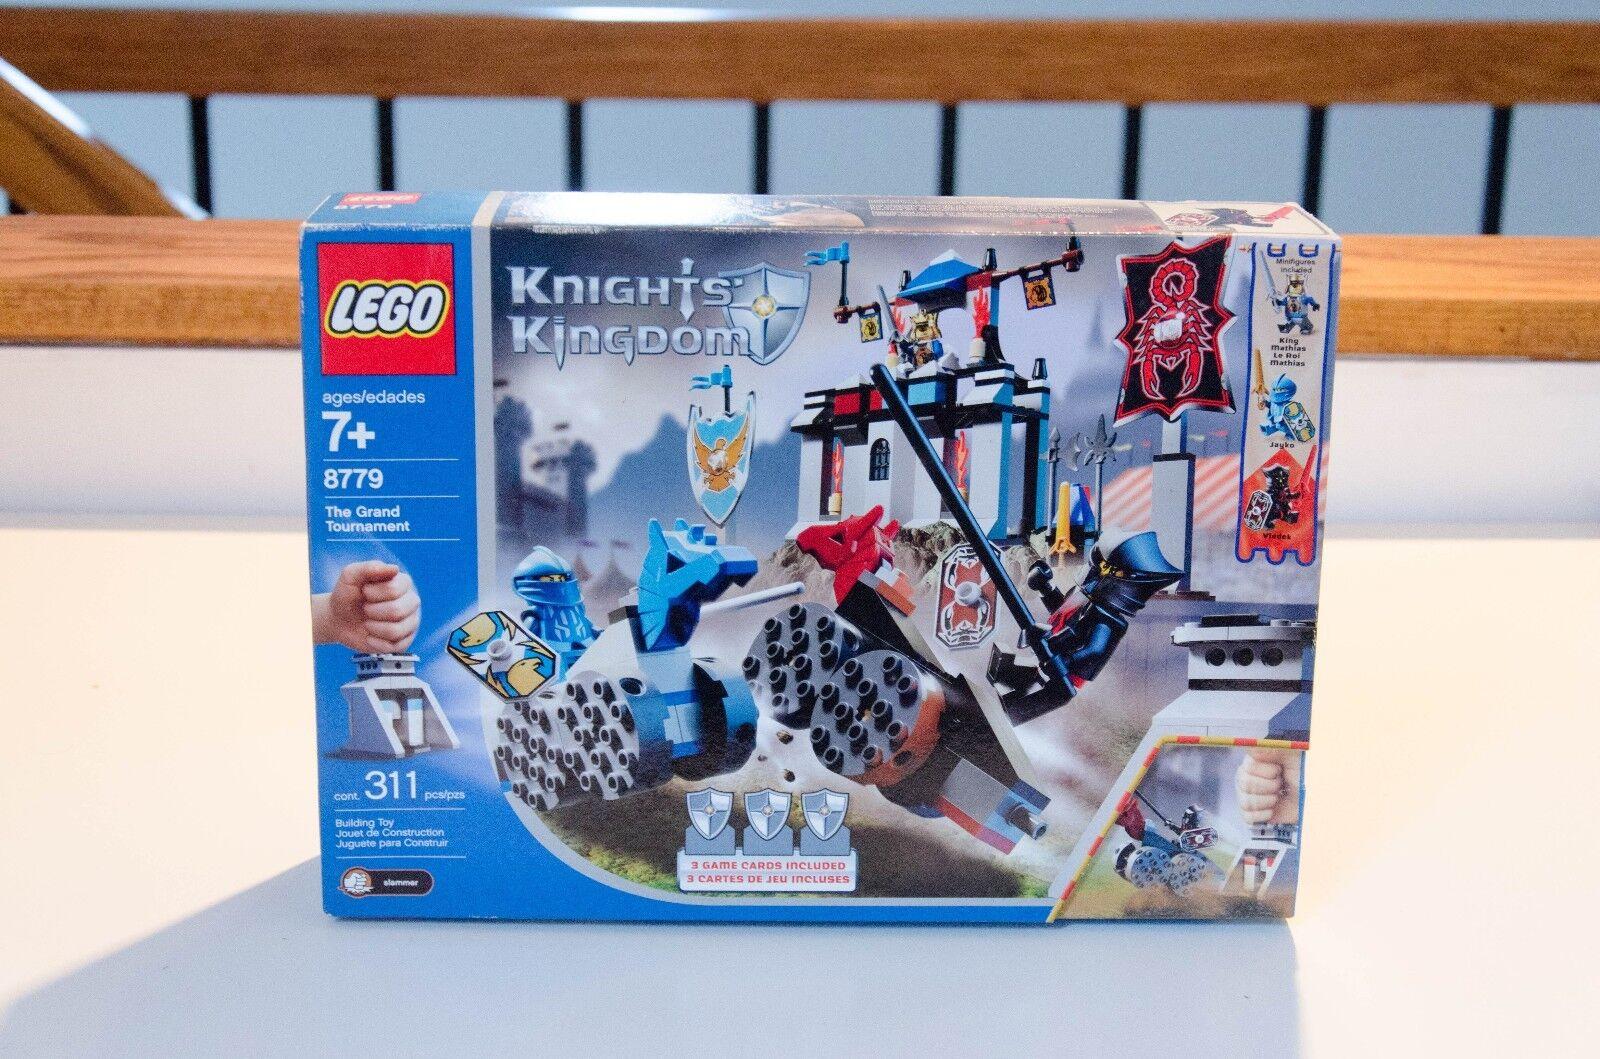 LEGO Castle Knights' Kingdom Tournament II The Grand Tournament Kingdom (8779) - Sealed f64173